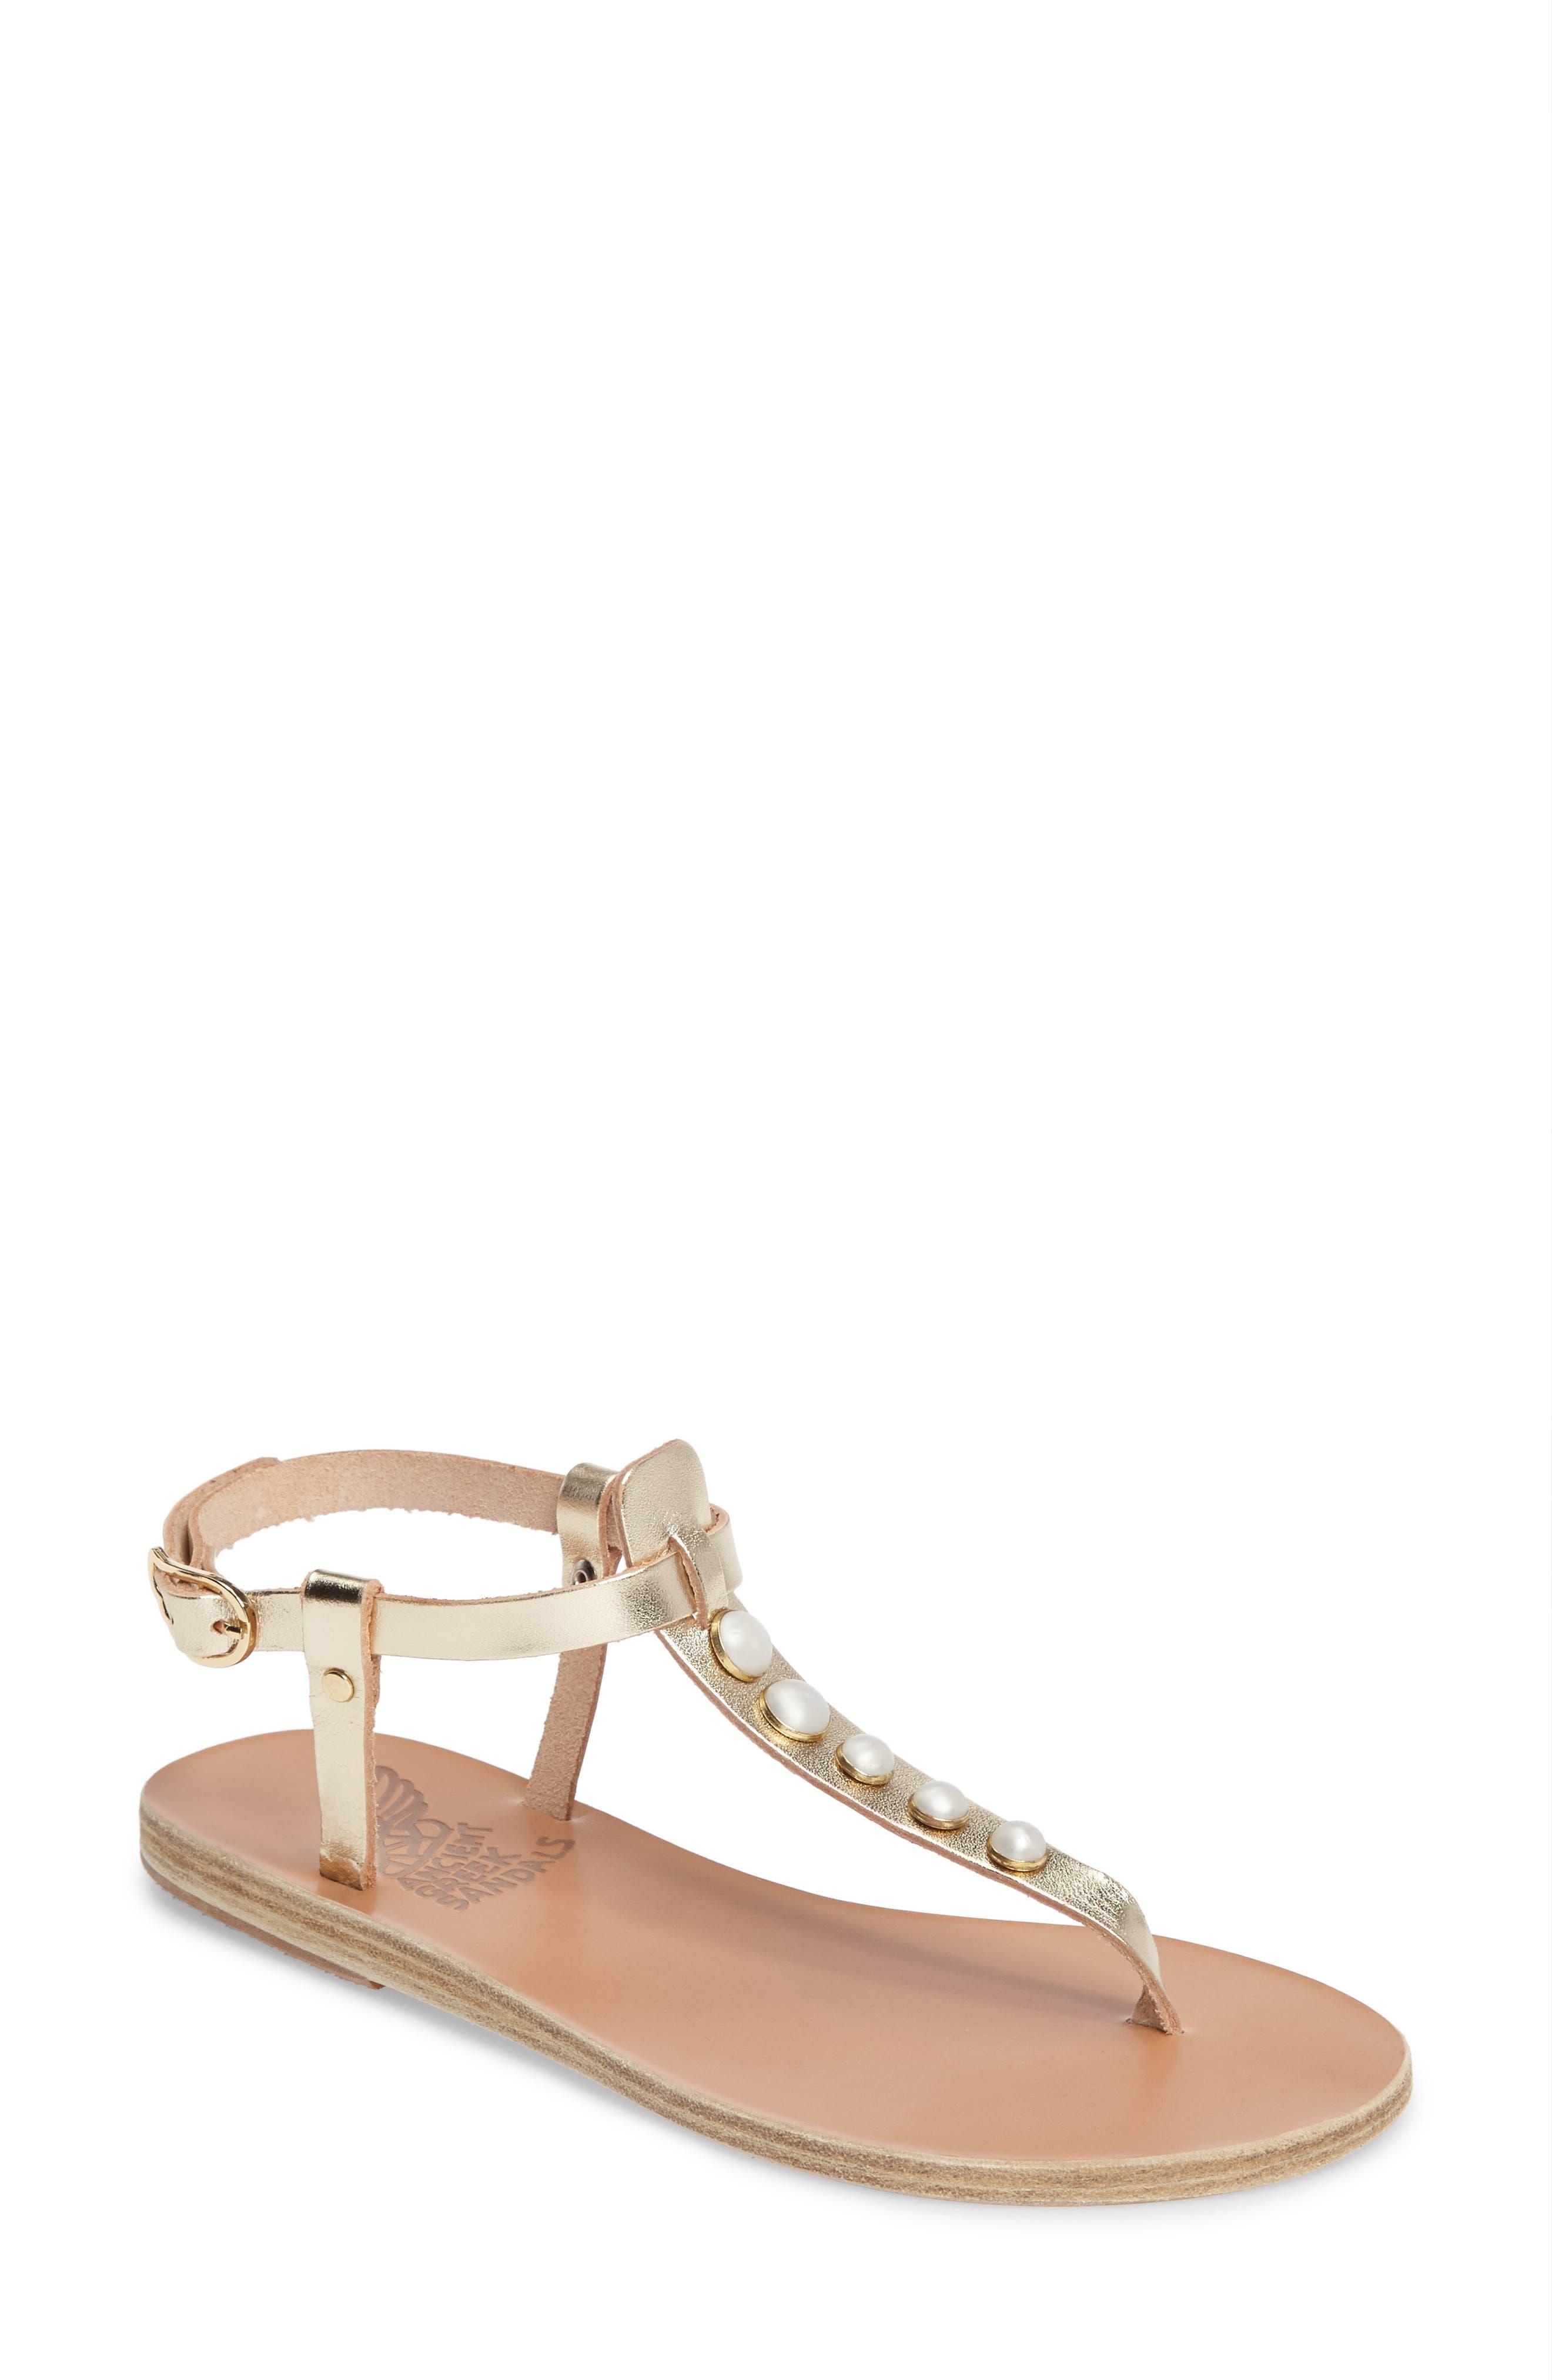 Lito Imitation Pearl Embellished T-Strap Sandal,                             Main thumbnail 1, color,                             040